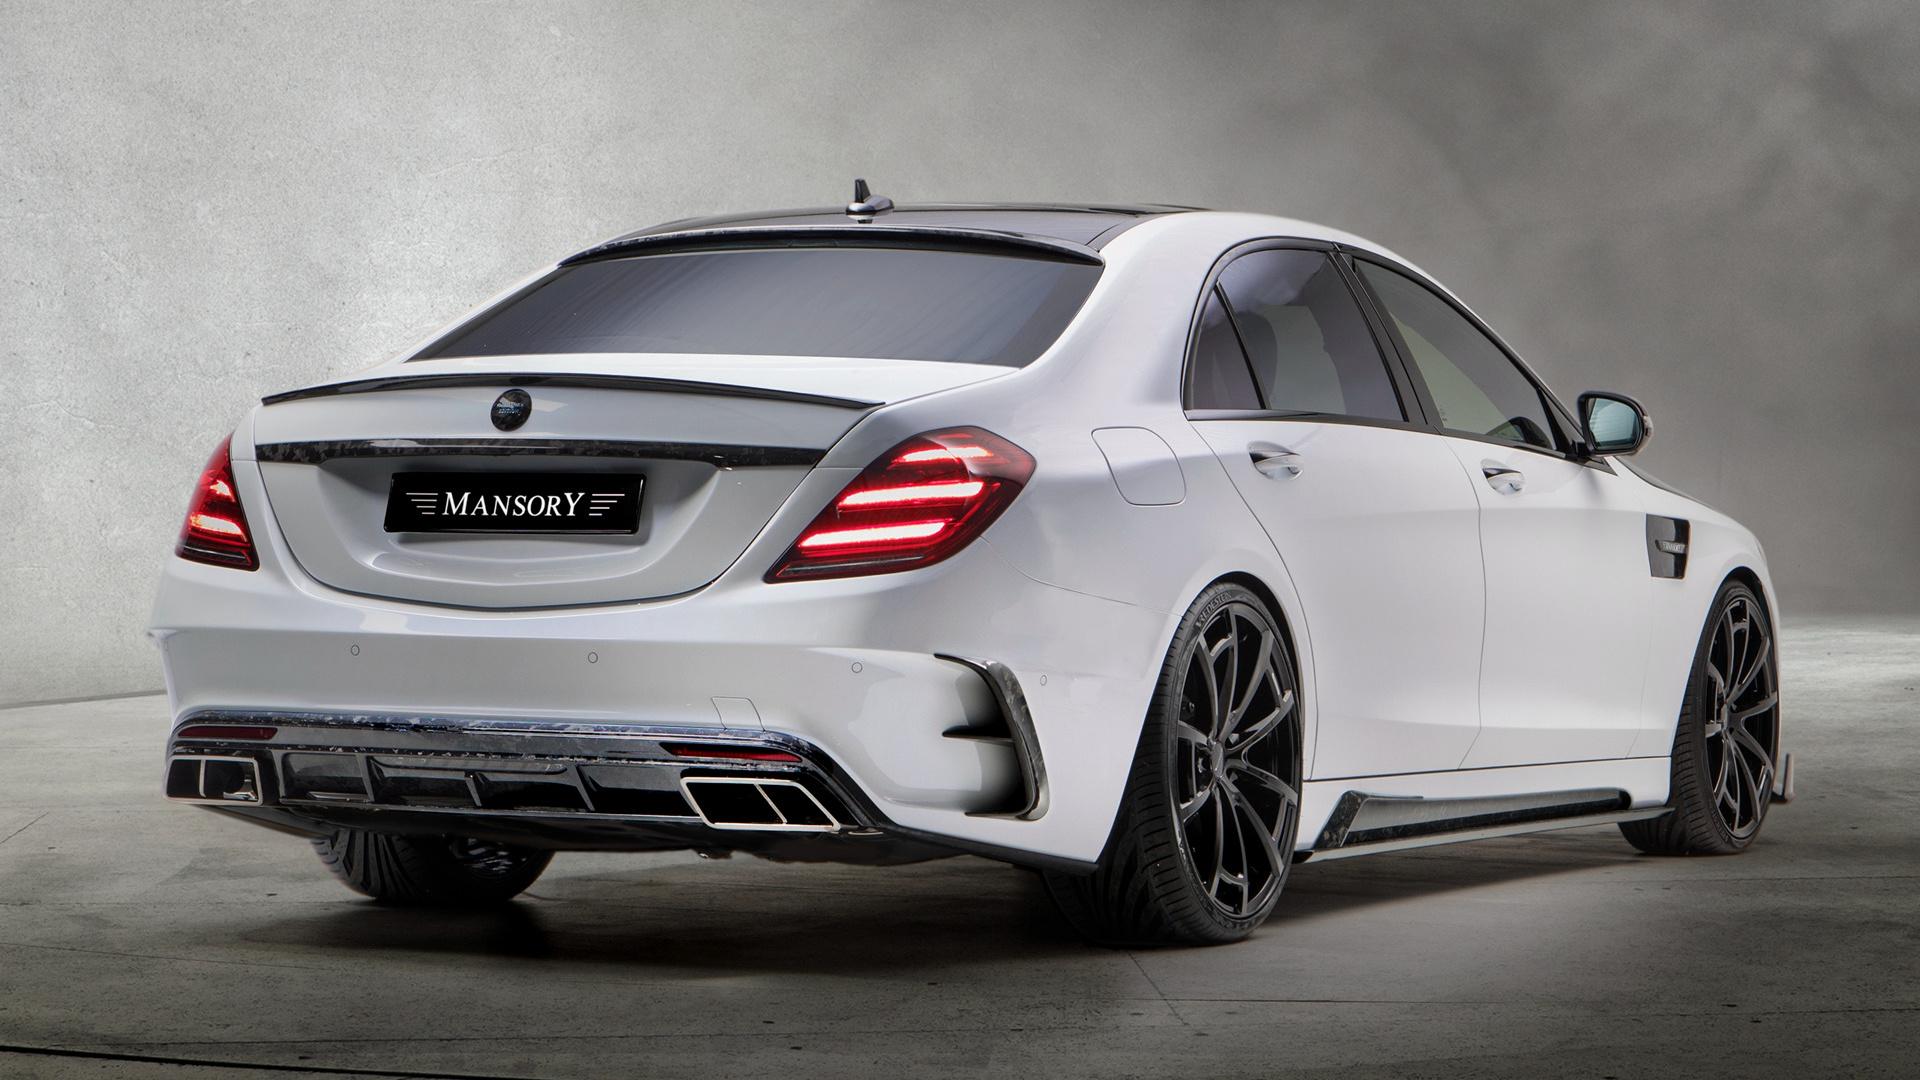 2018 Mercedes Amg S 63 Signature Edition By Mansory Fondo De